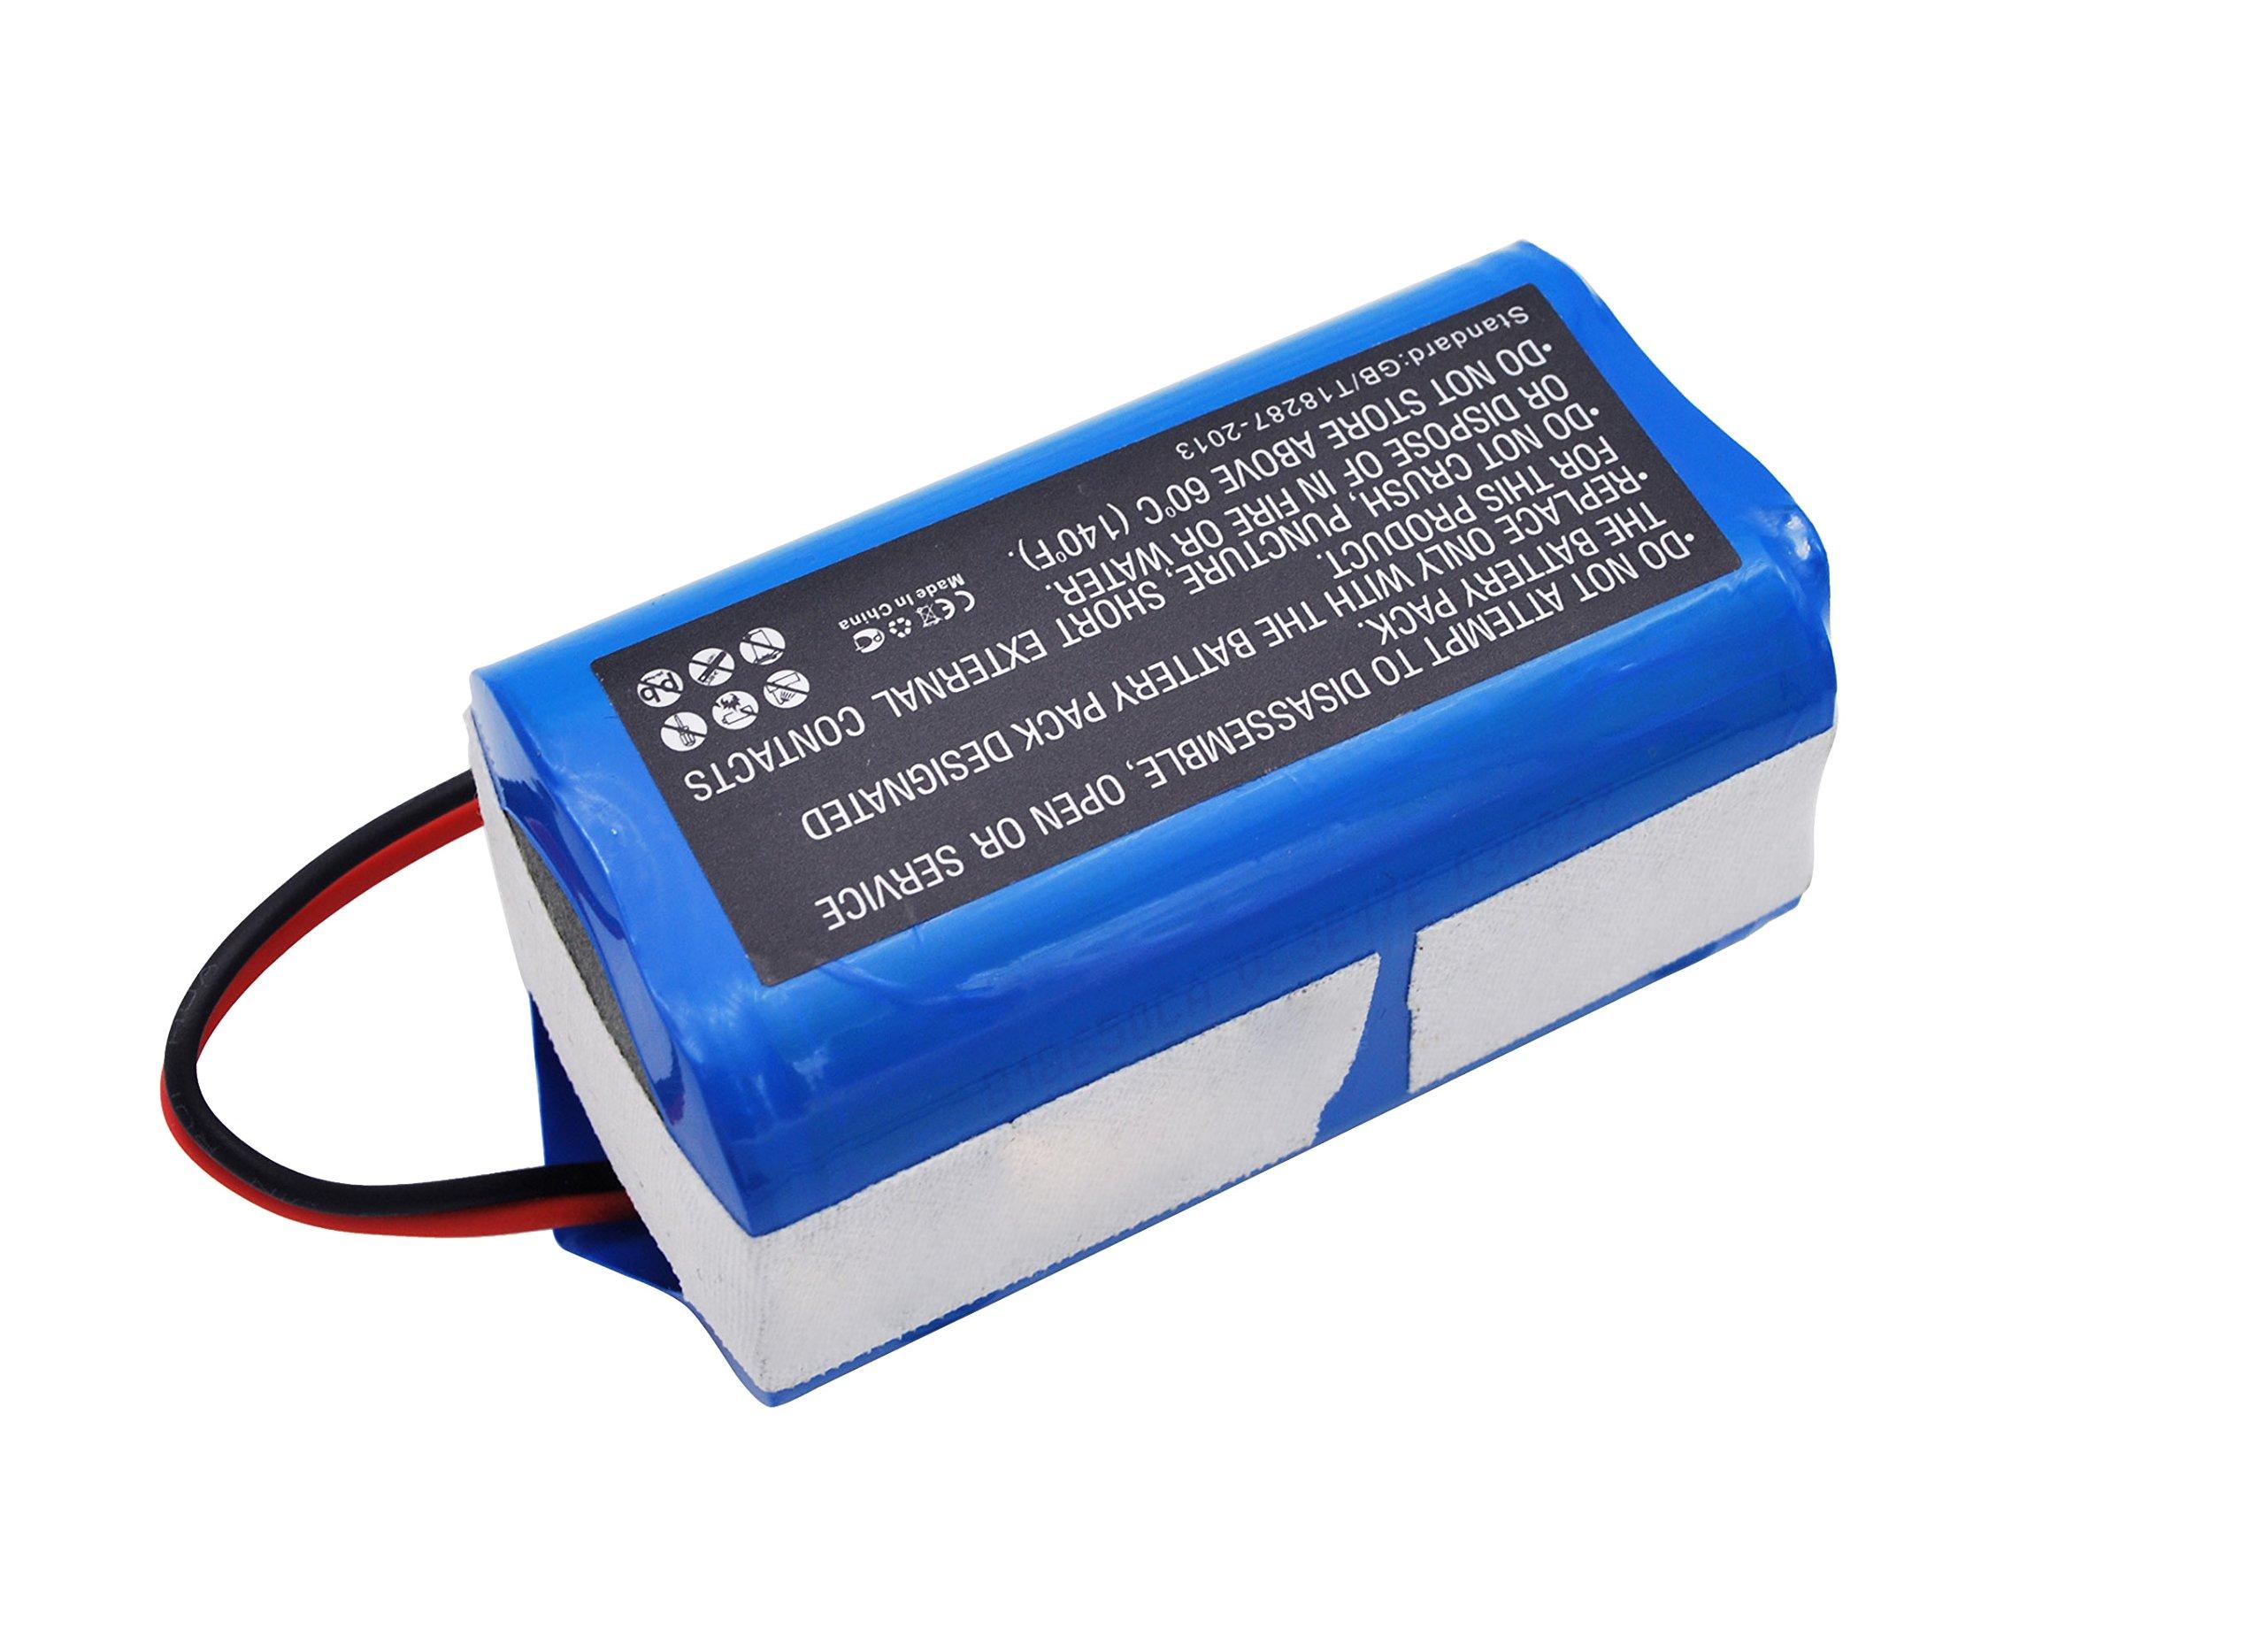 CameronSino Replacement Battery for DIBEA/ECOVACS/ILIFE Vacuum Backup Battery 2600mAh /38.48Wh /14.8V,Blue